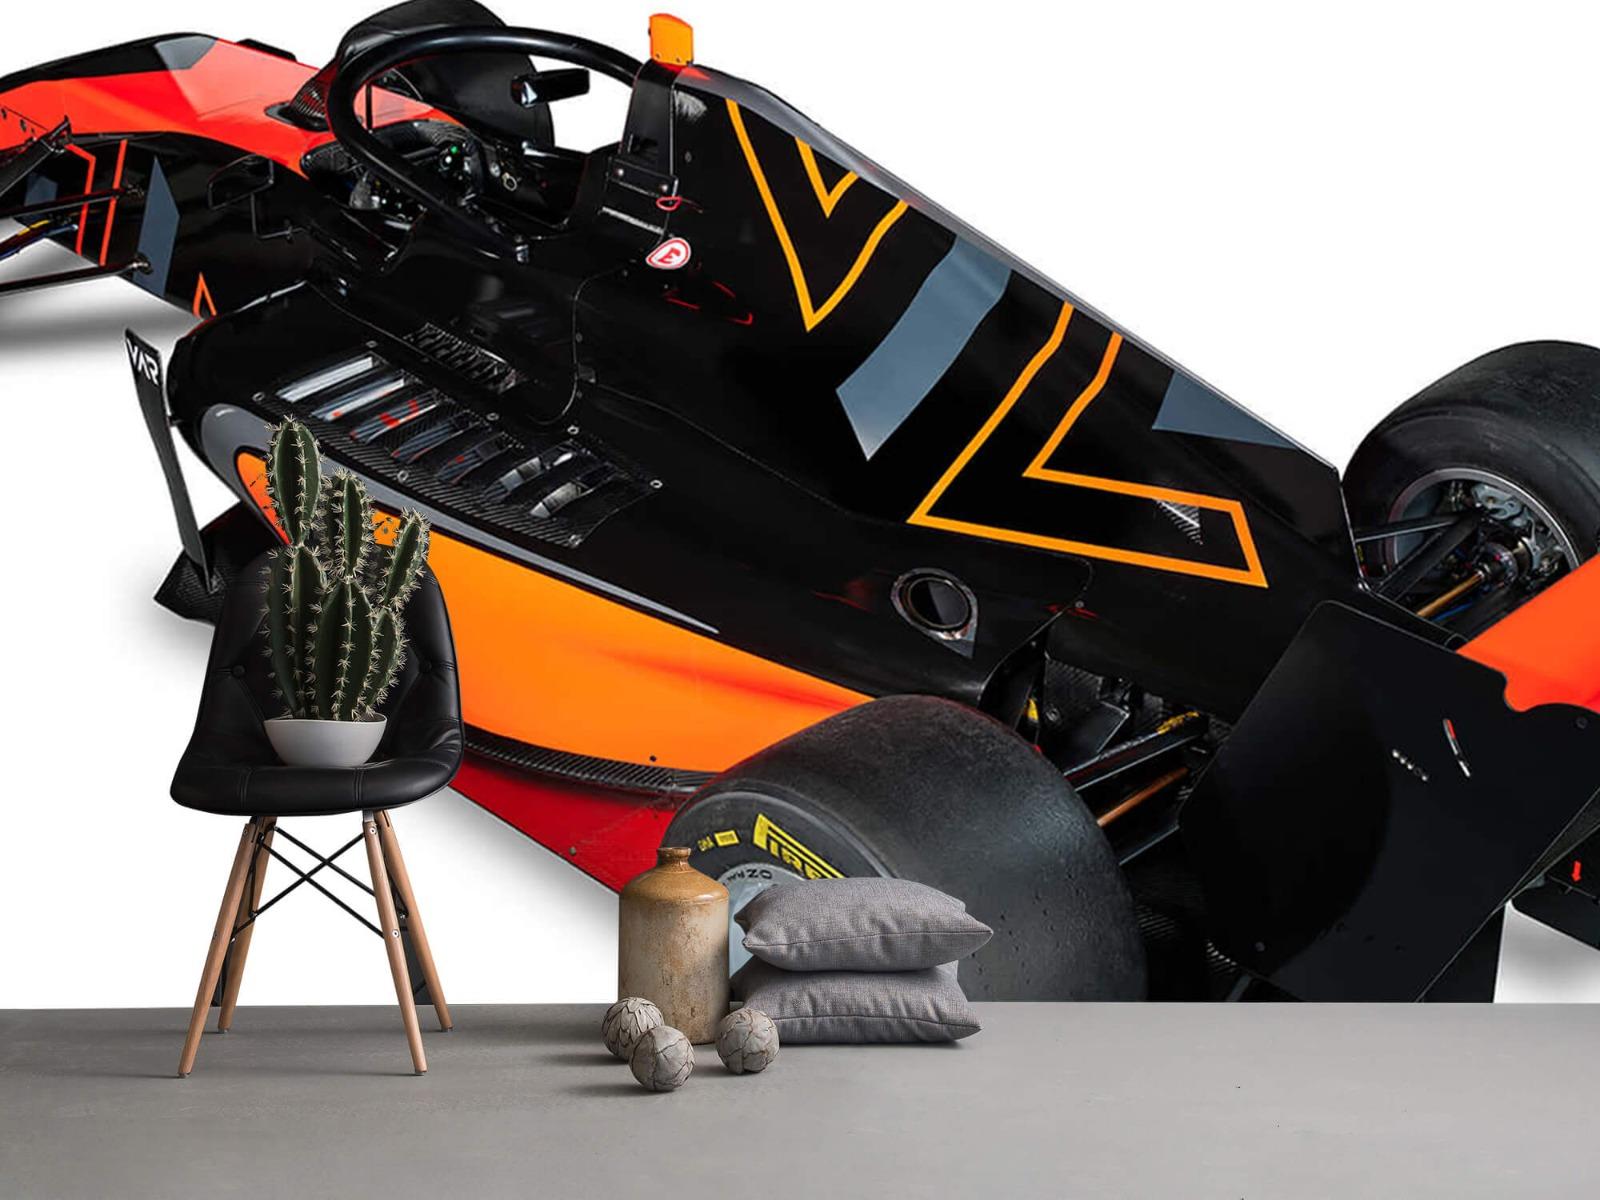 Sportauto's - Formula 3 - Rear left view - Hobbykamer 13